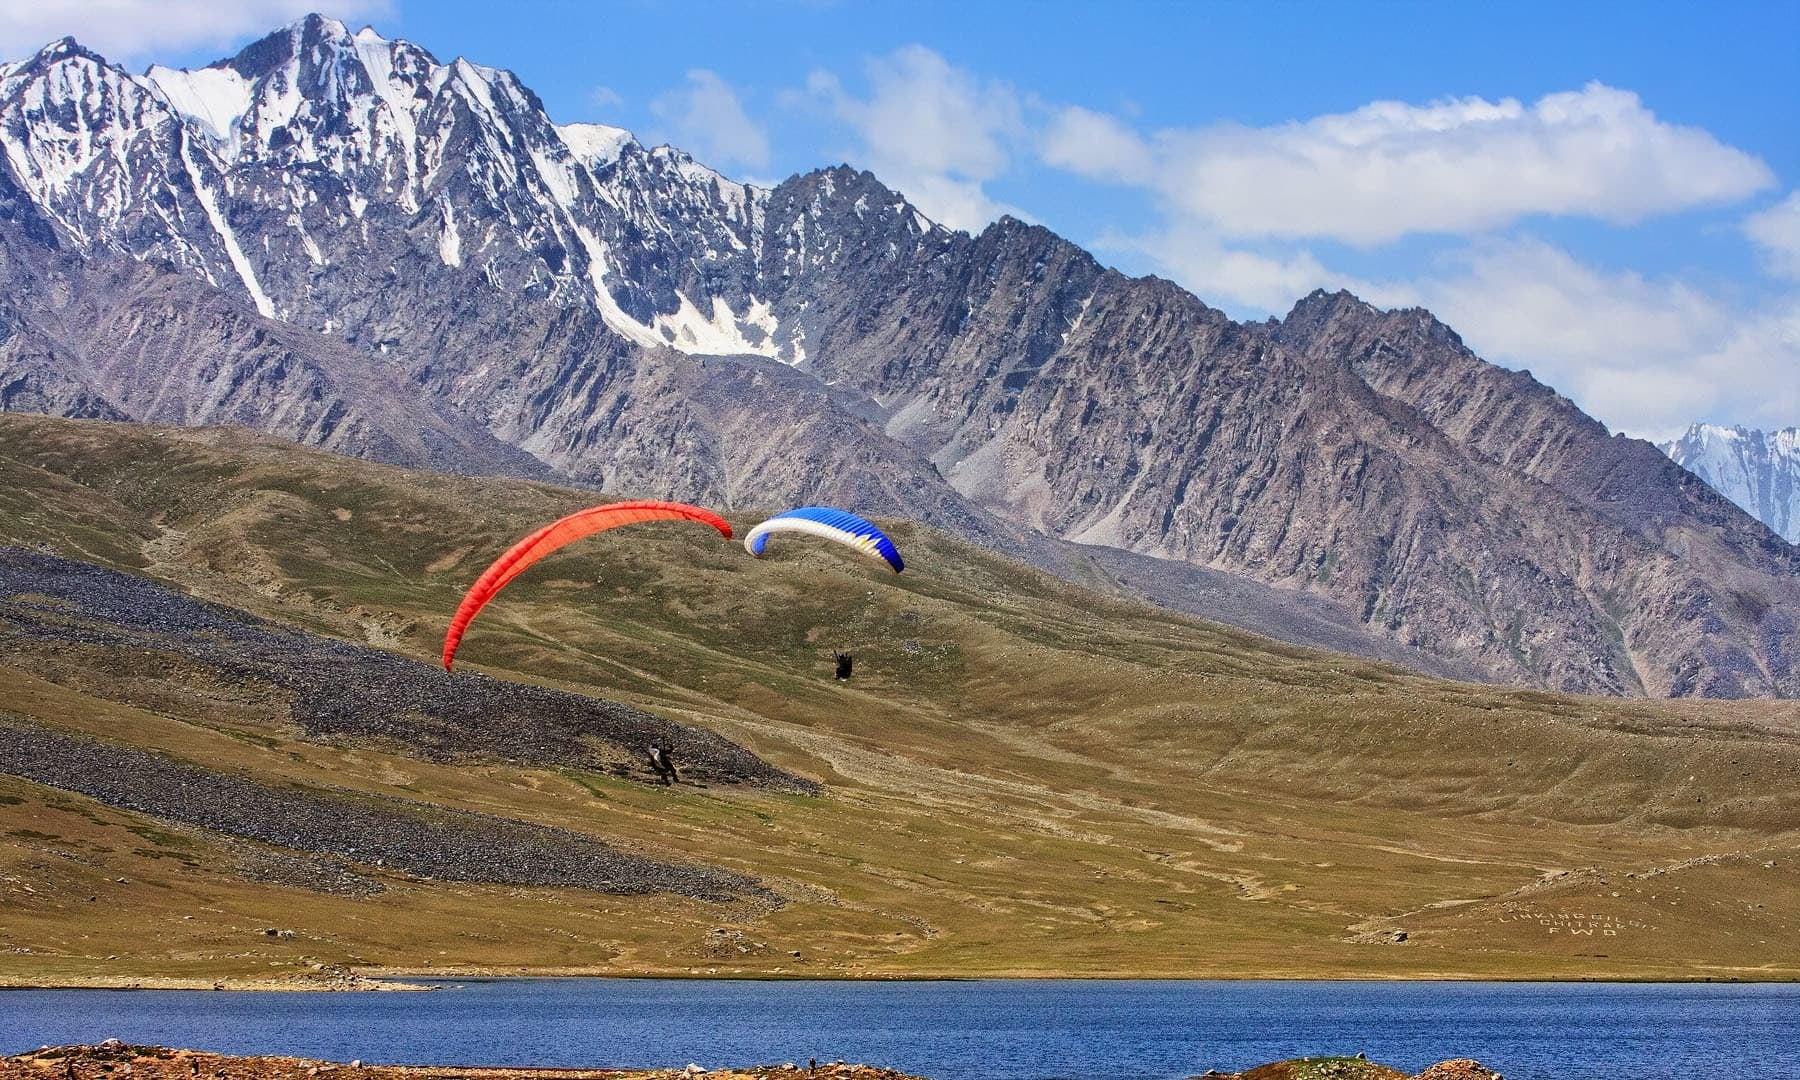 Paragliding at Shandur Lake.